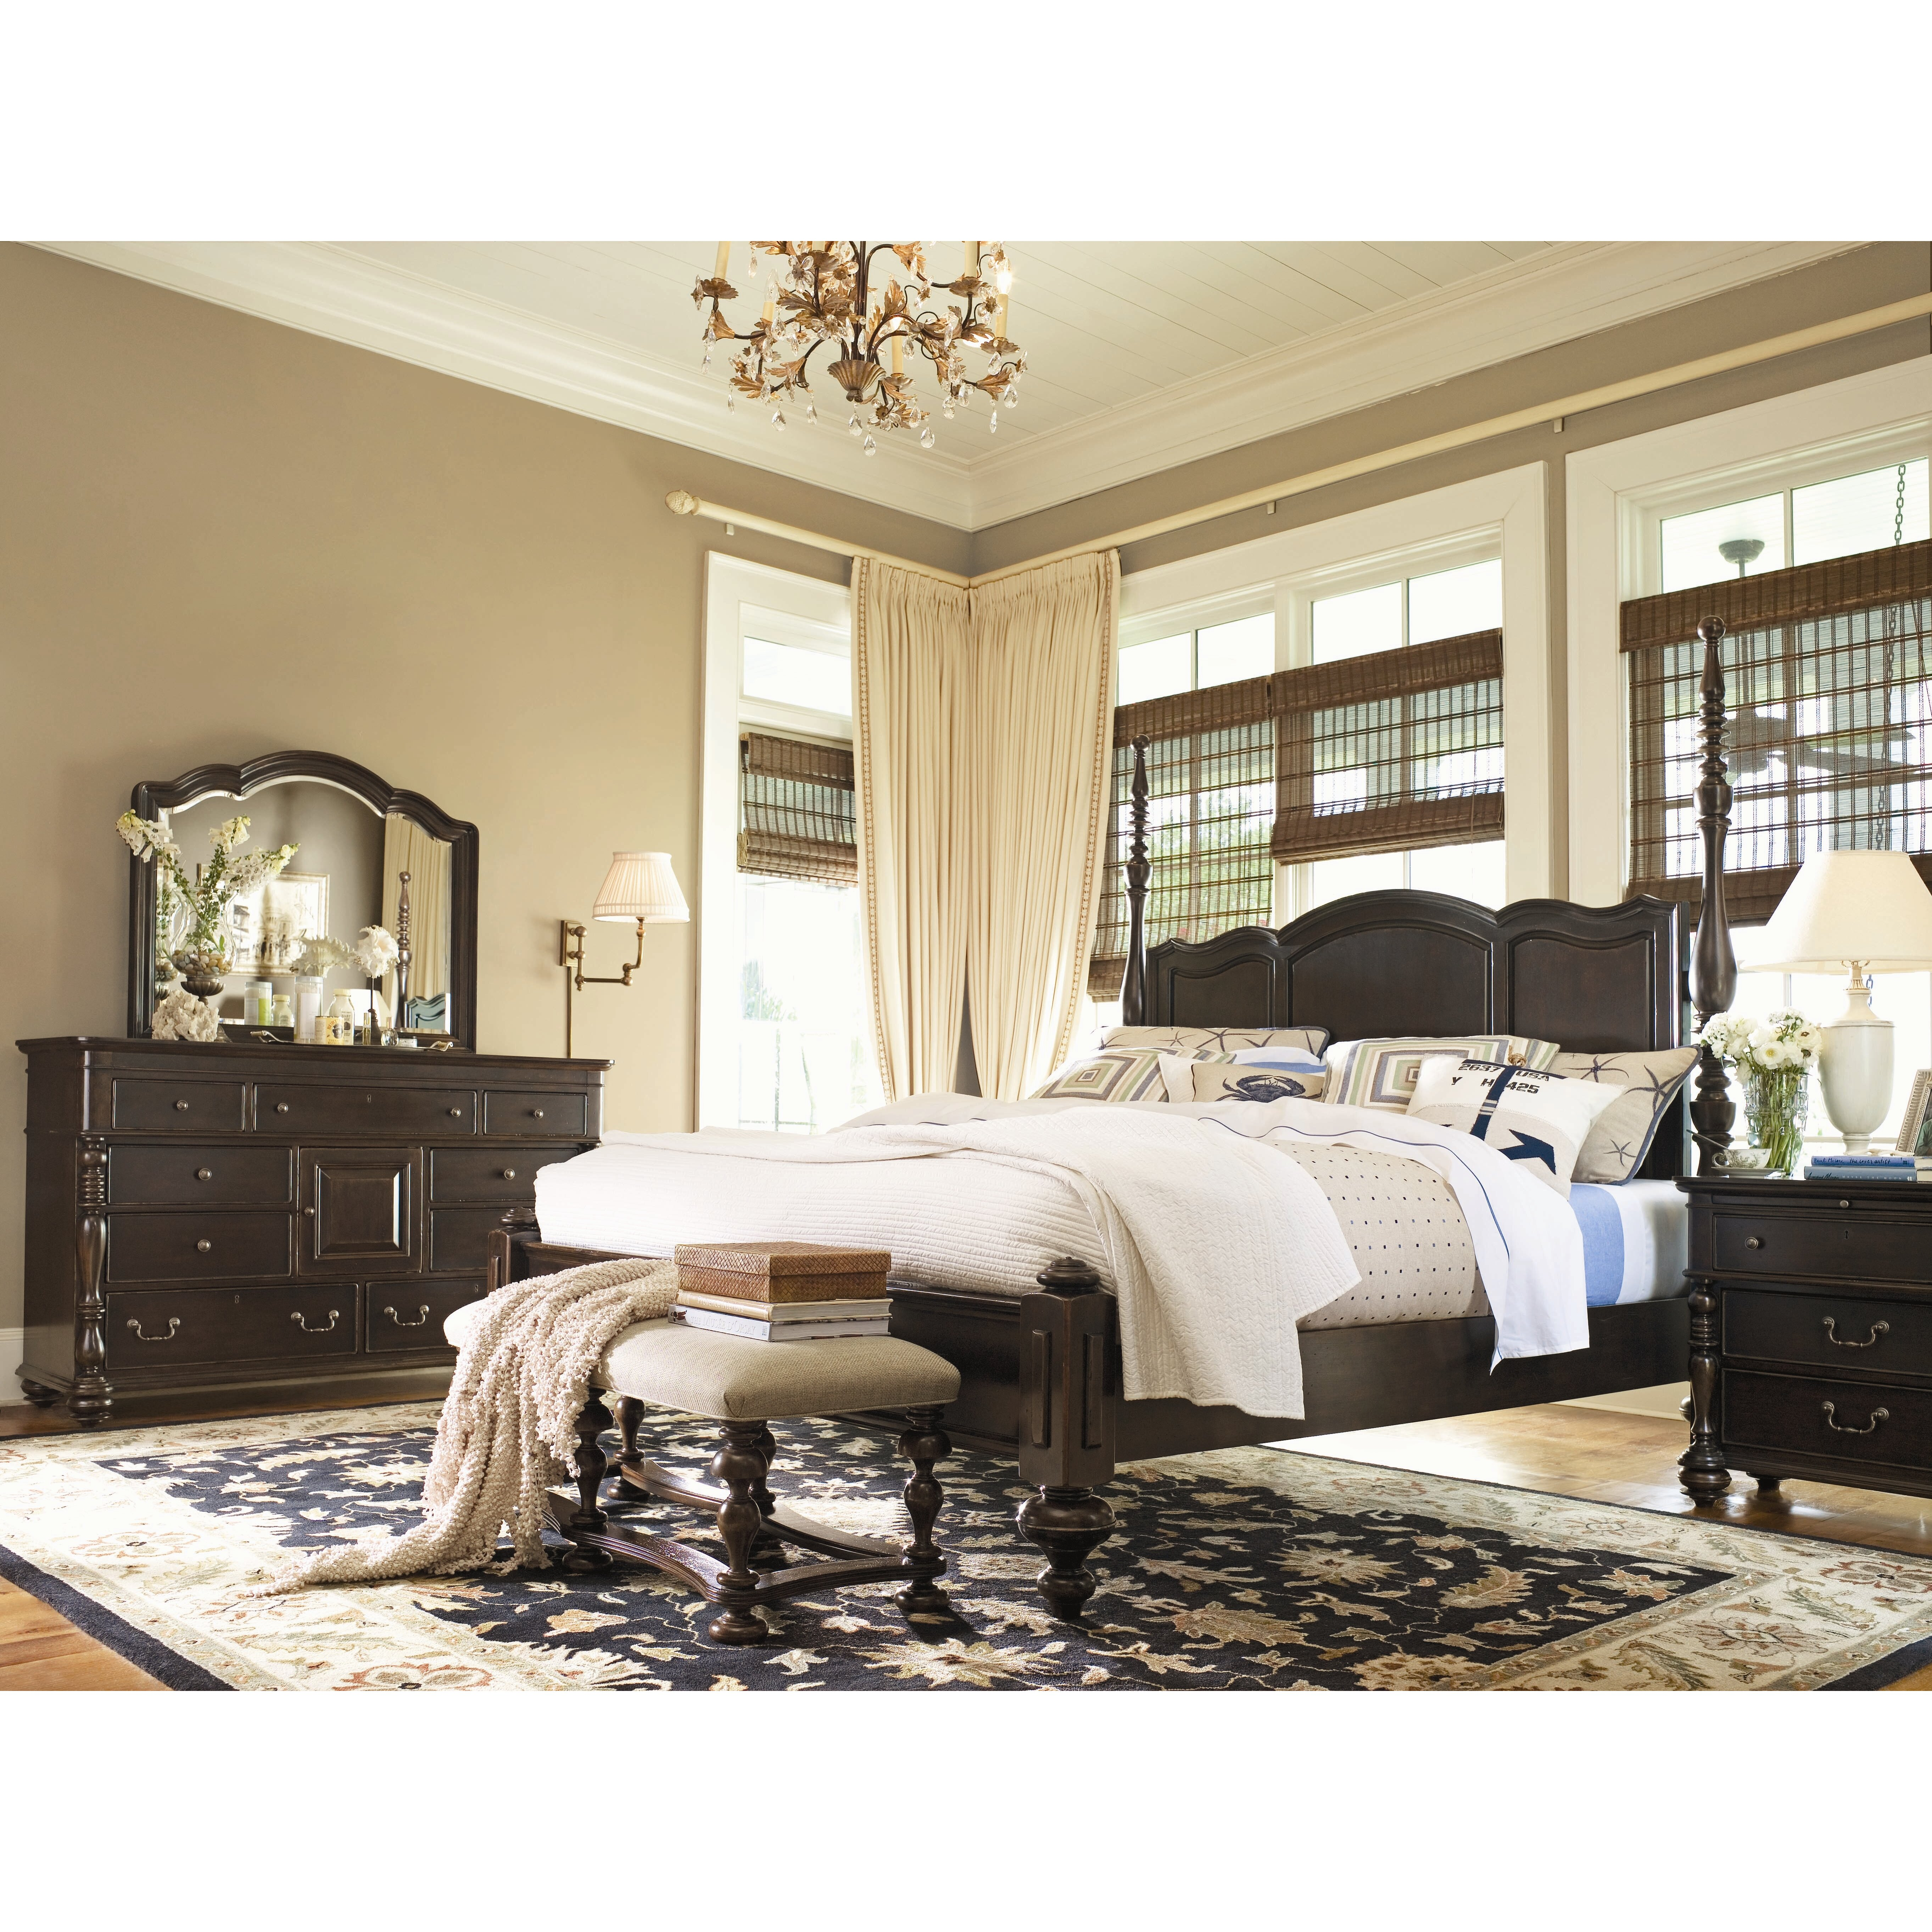 Attractive Cindy Crawford Bedroom Furniture 11 Cindy Crawford Savannah  Bedroom Furniture Best Bedroom Ideas 2017Cindy Crawford Bedroom Set Moncler  Factory ...